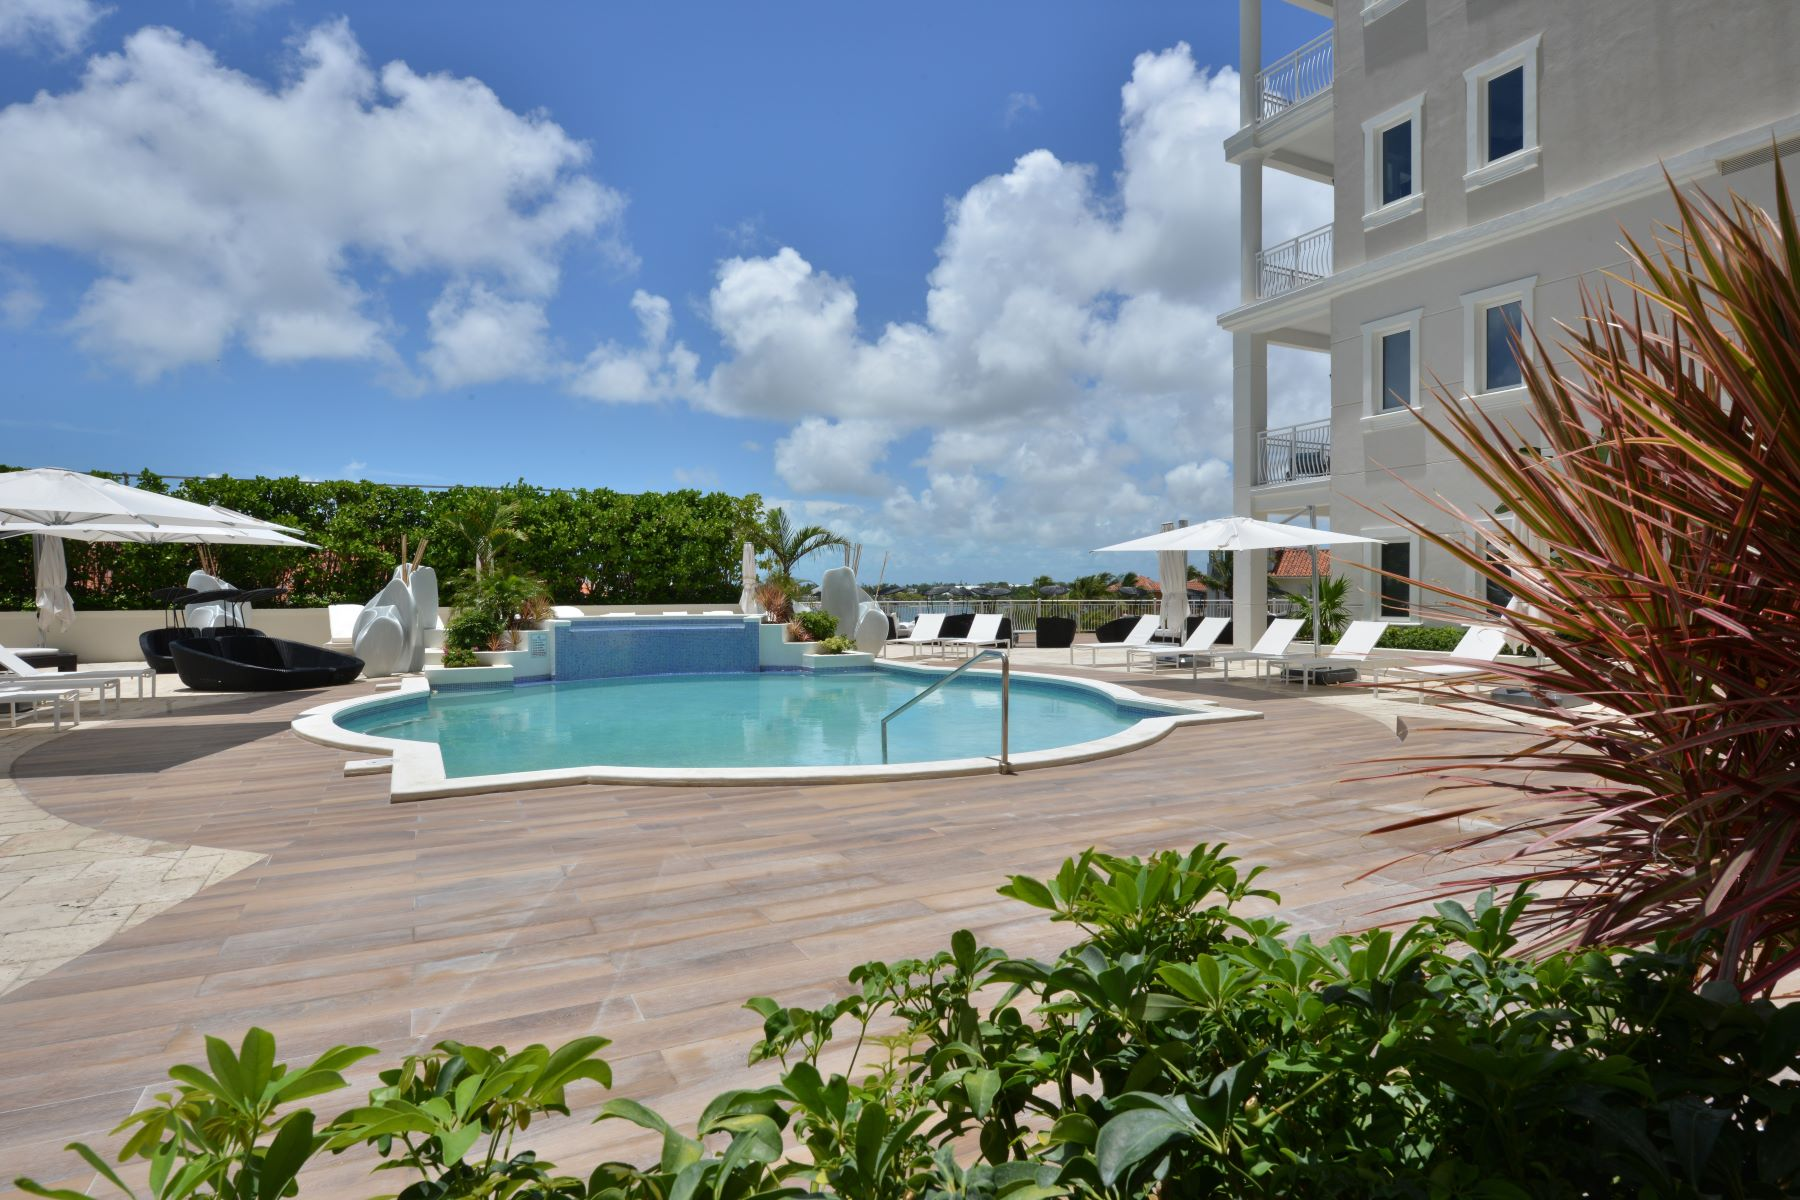 Condominium for Sale at One Ocean #402 One Ocean, Paradise Island, Nassau And Paradise Island Bahamas